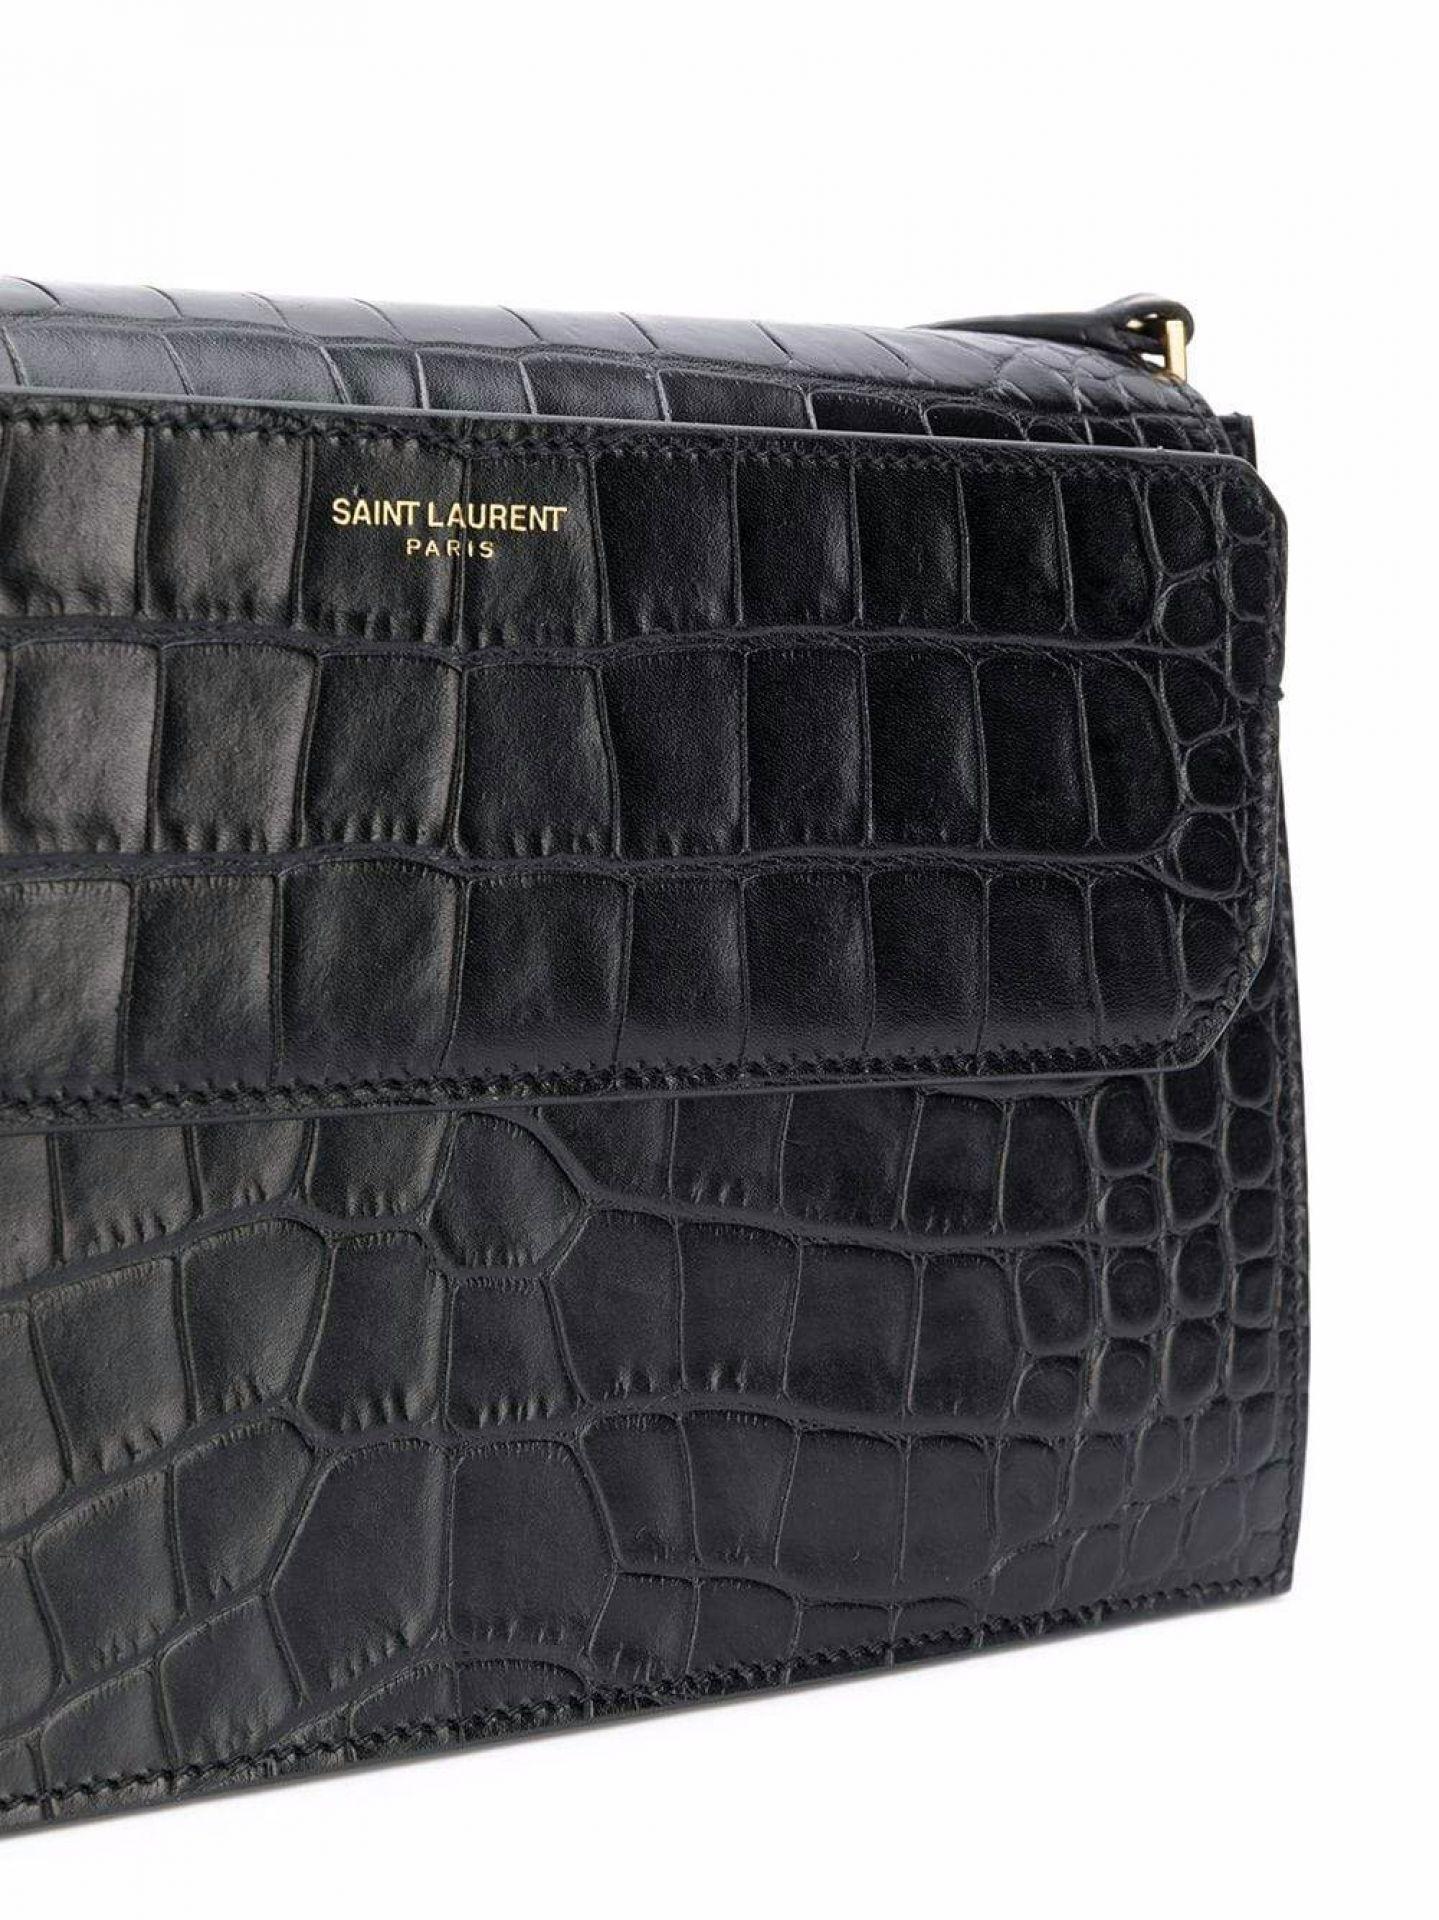 SAINT LAURENT WOMENS BLACK LEATHER CROC EMBOSSED CATHERINE SHOULDER BAG